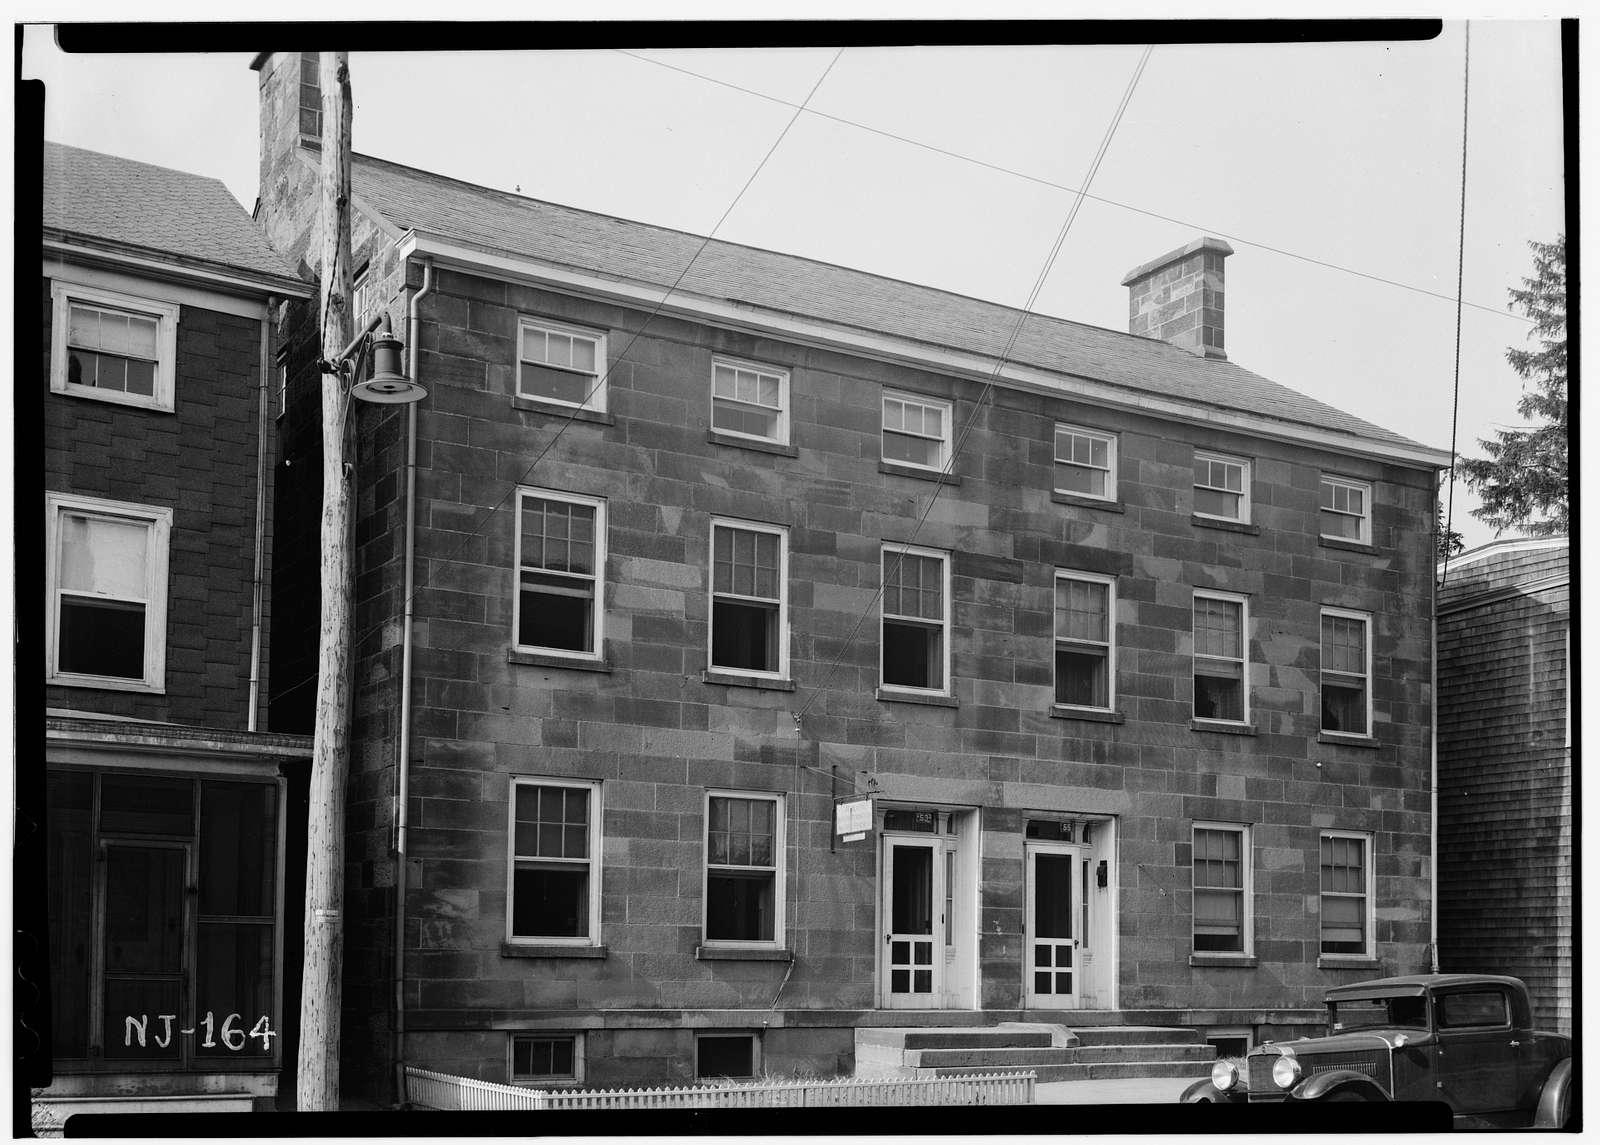 Matches-Beattie House, 53-55 Main Street, Little Falls, Passaic County, NJ